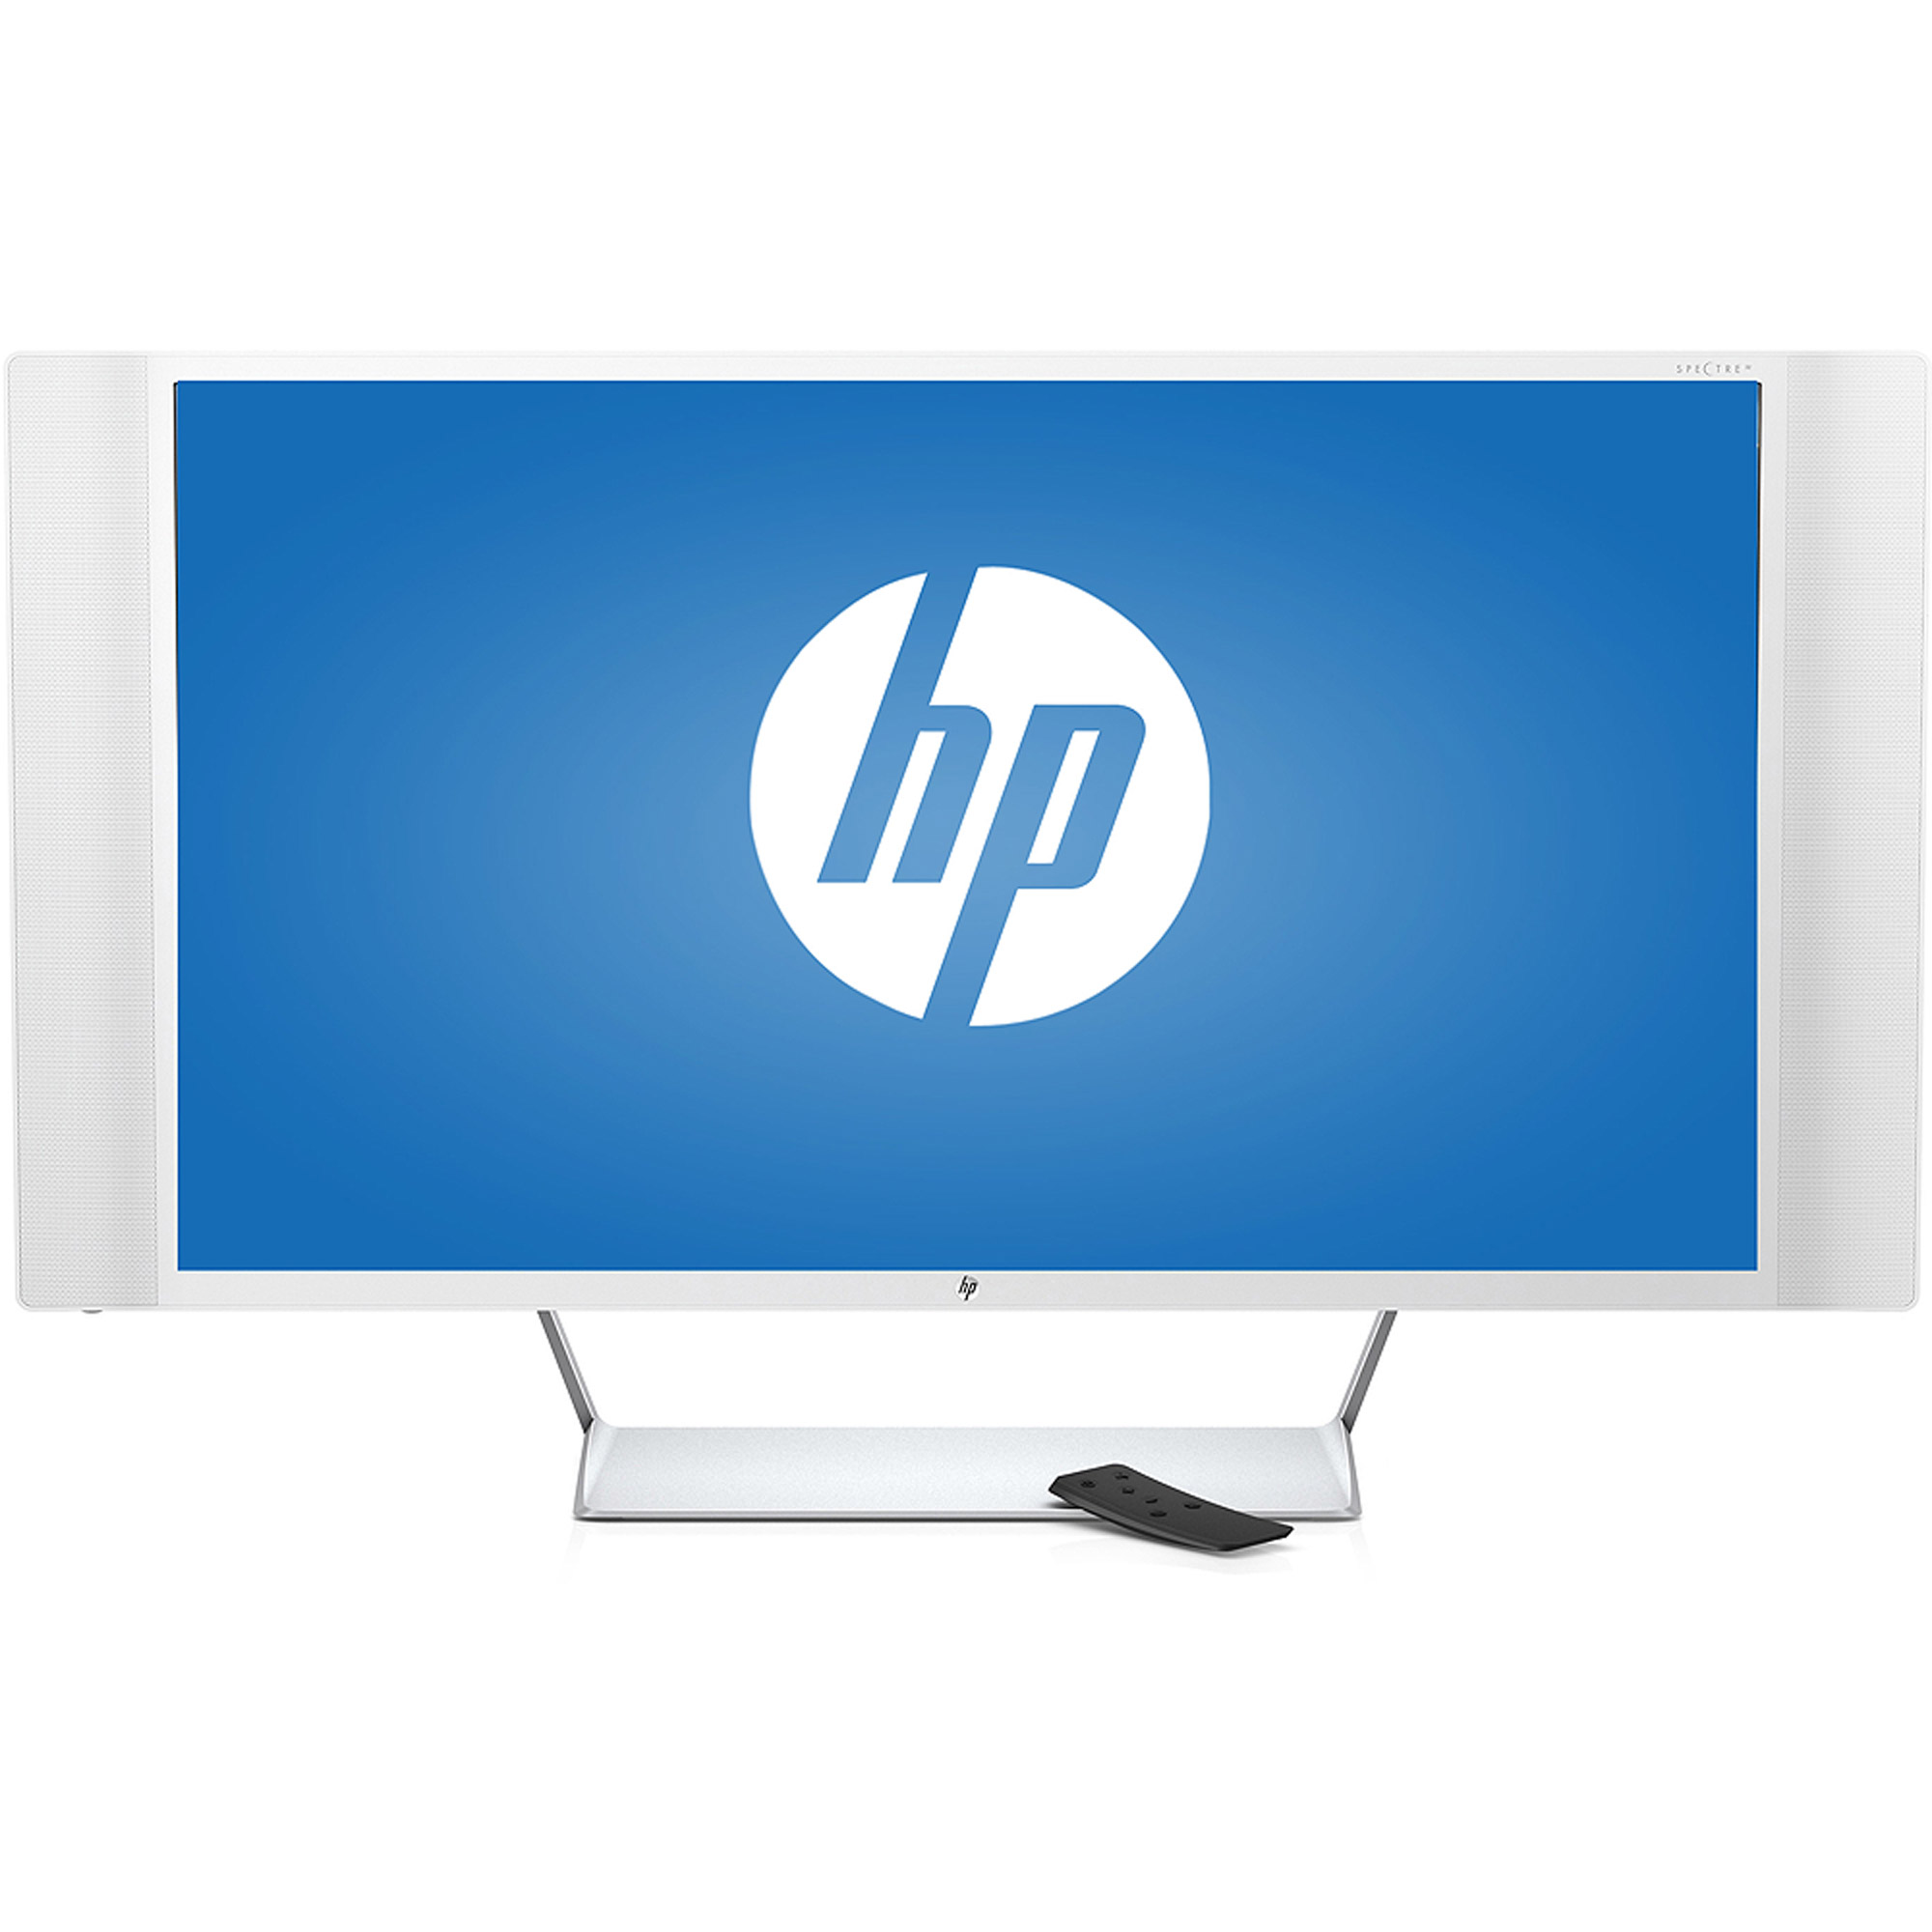 HP 32